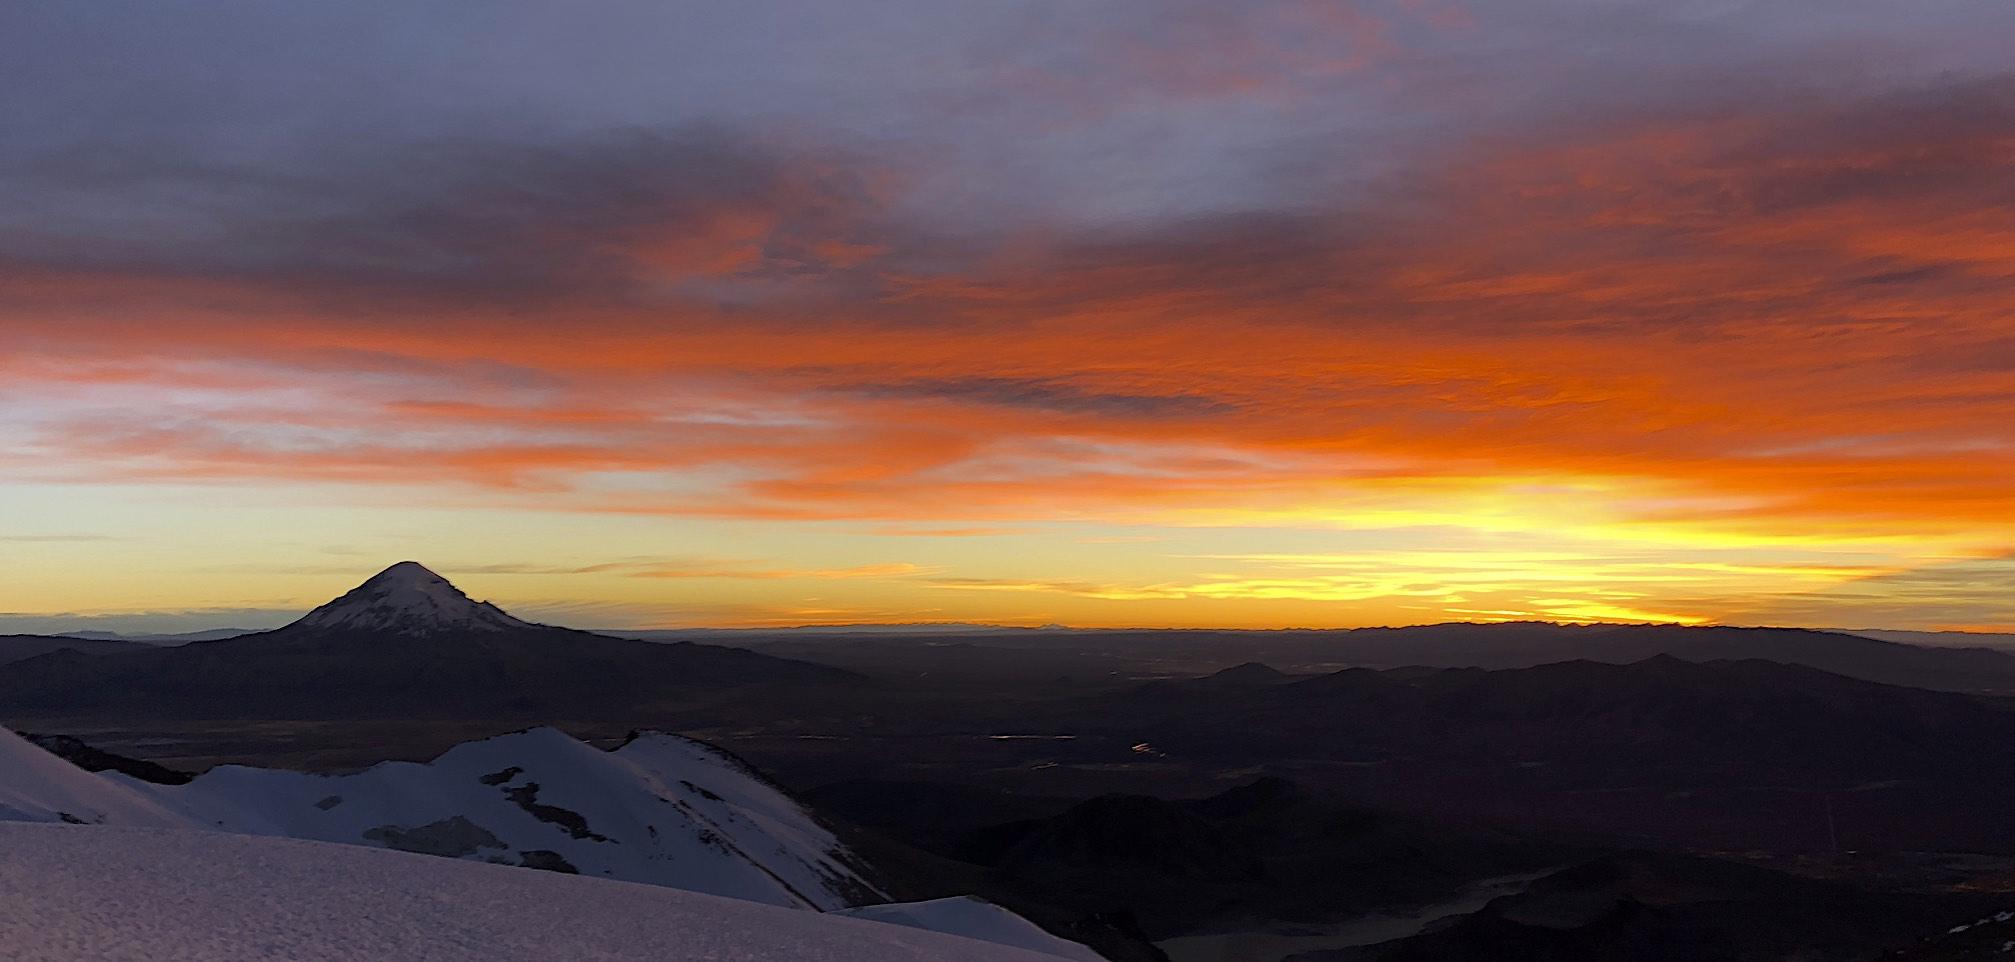 Volcan Sajama and sunrise on Acotango